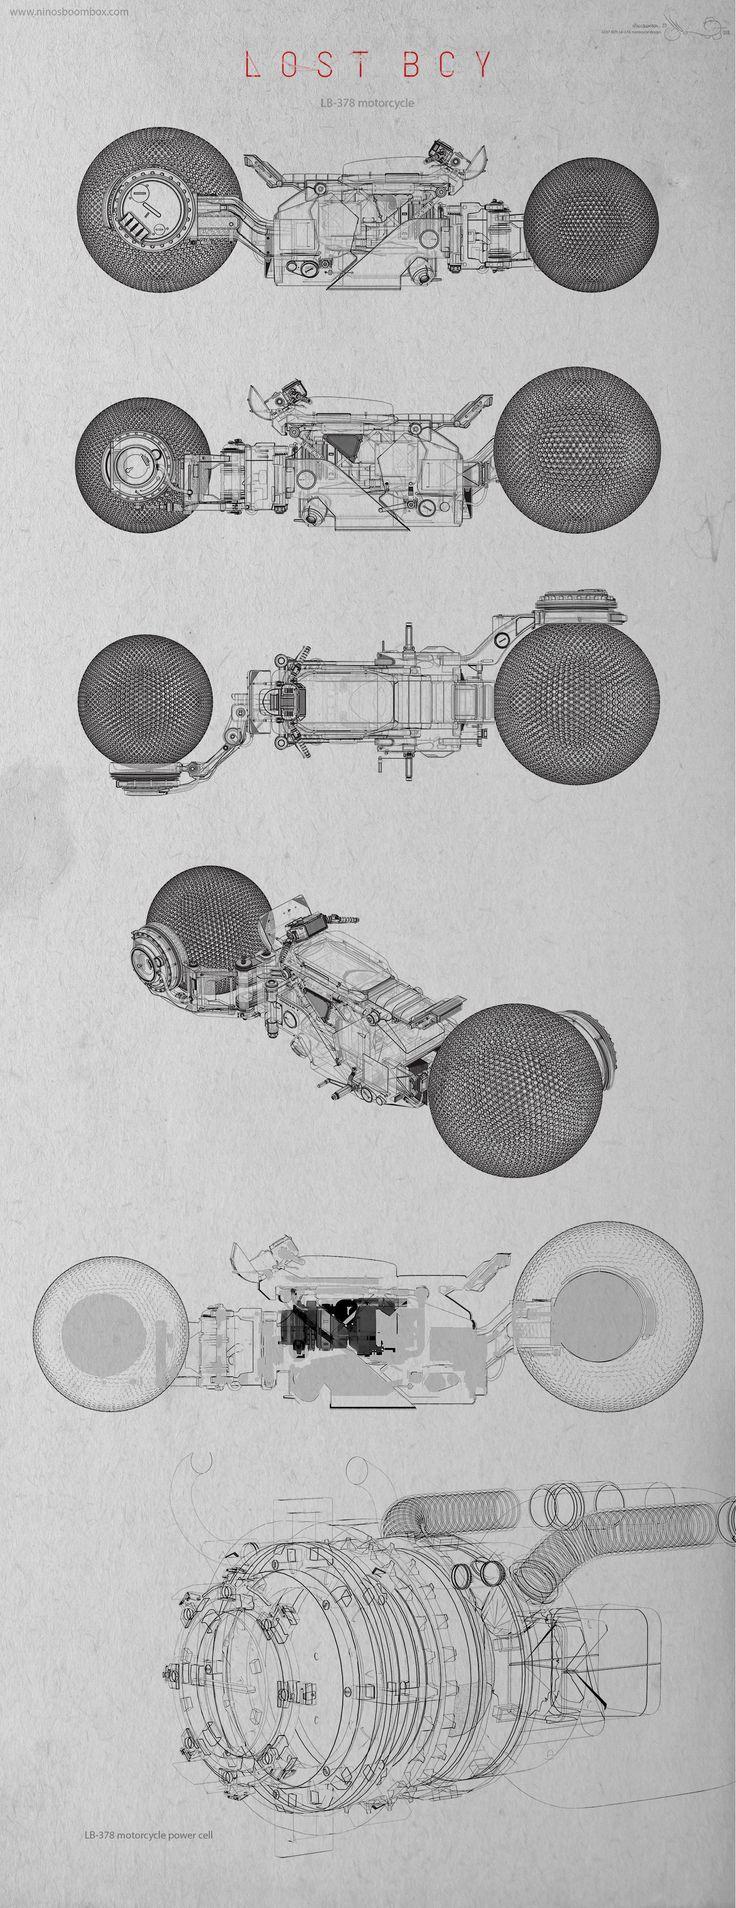 ArtStation - LOST BOY bike development, patrick (ninosboombox ) razo